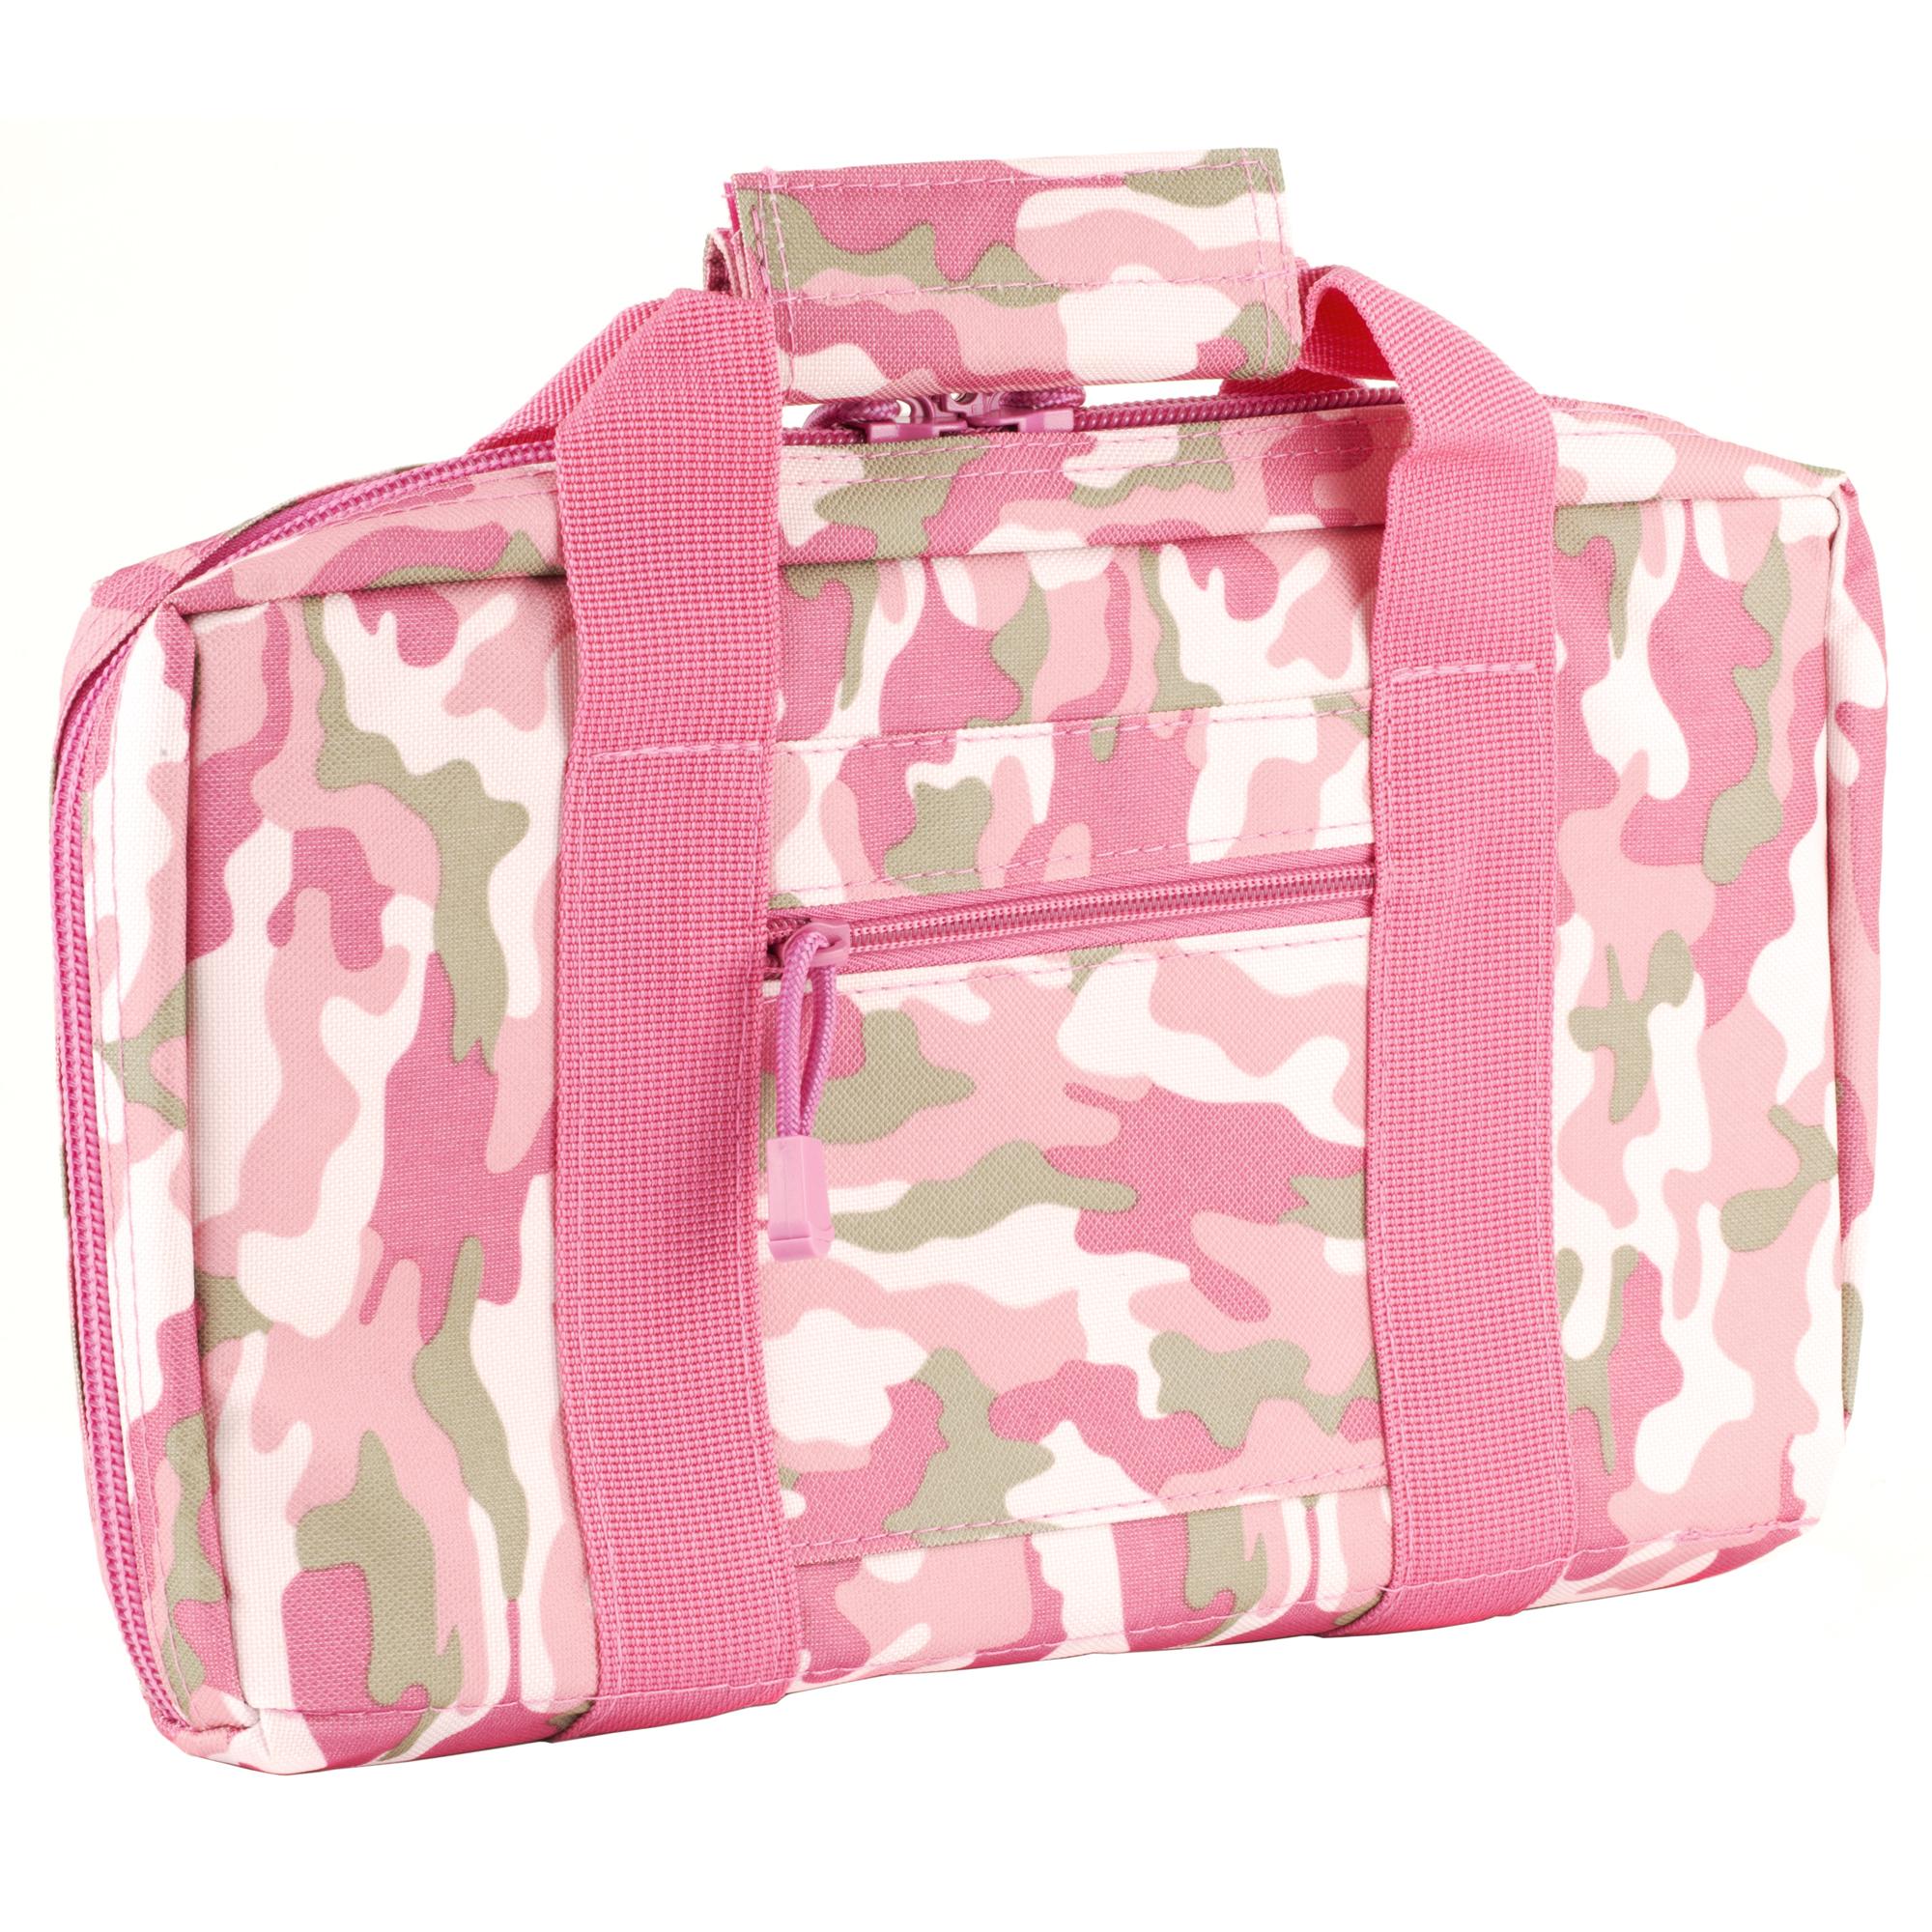 NCSTAR Discreet Pistol Case Nylon – Pink